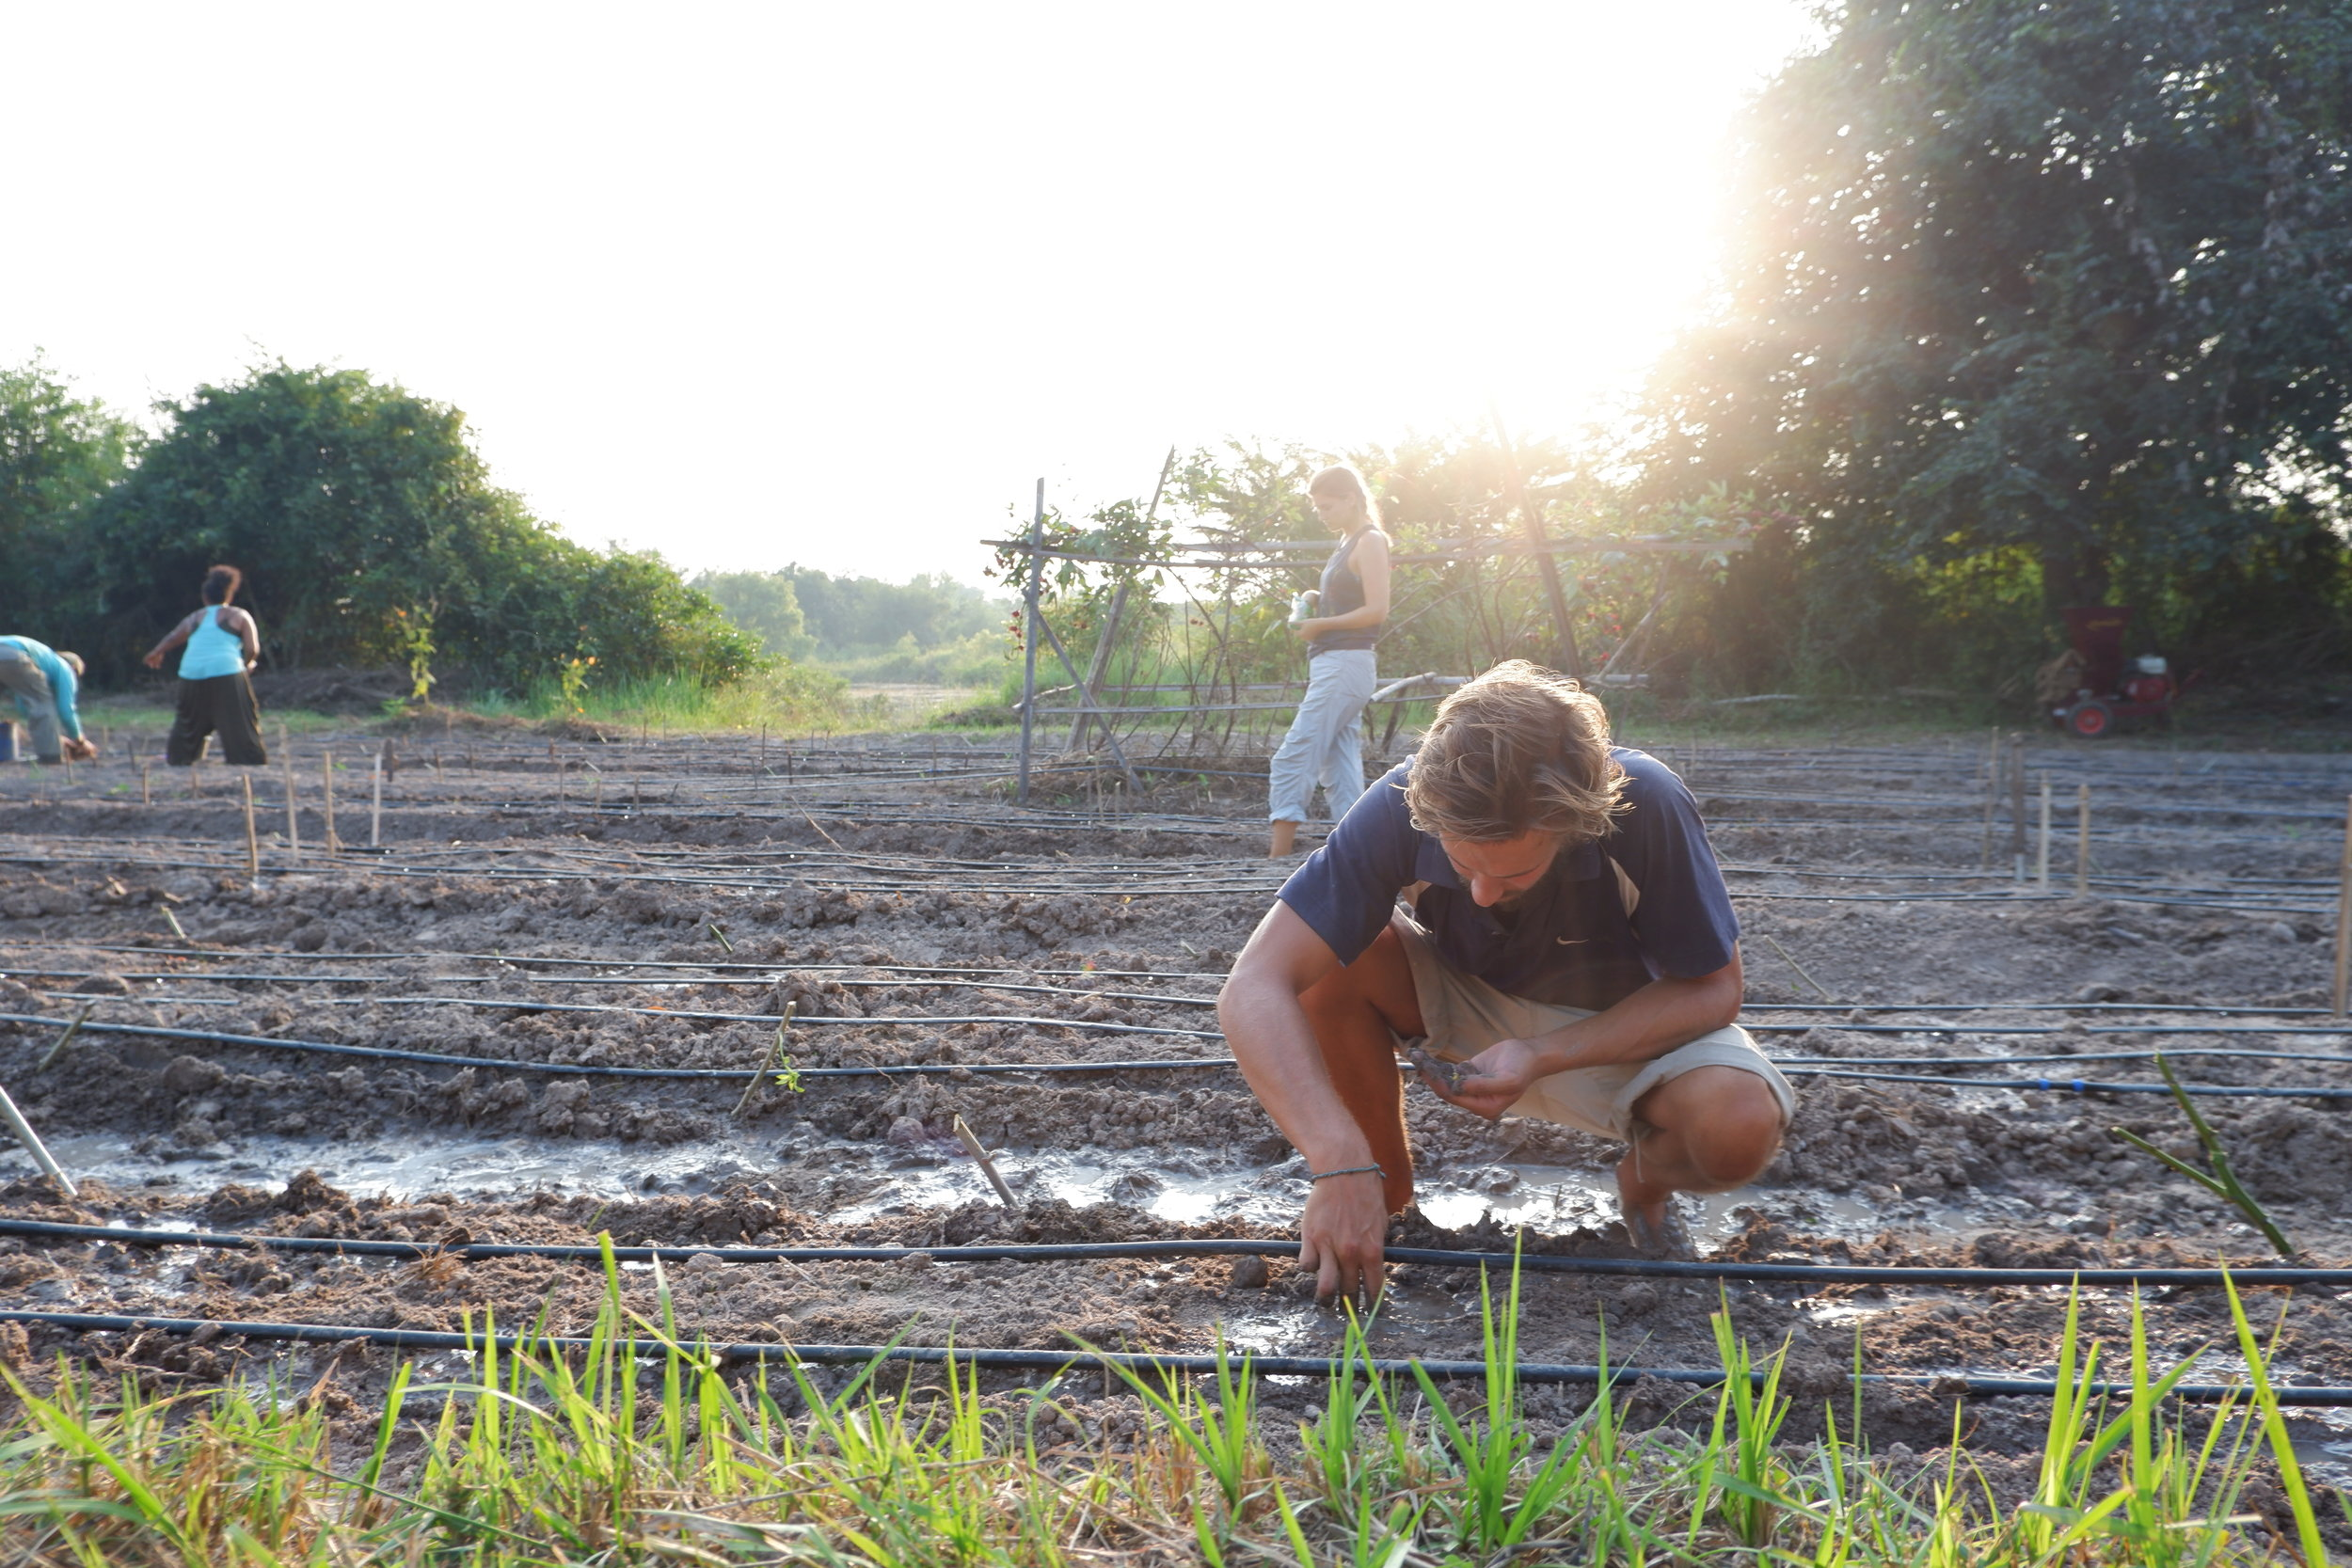 Planting seeds on large-scale garden beds.  Photo: Julien De Backer